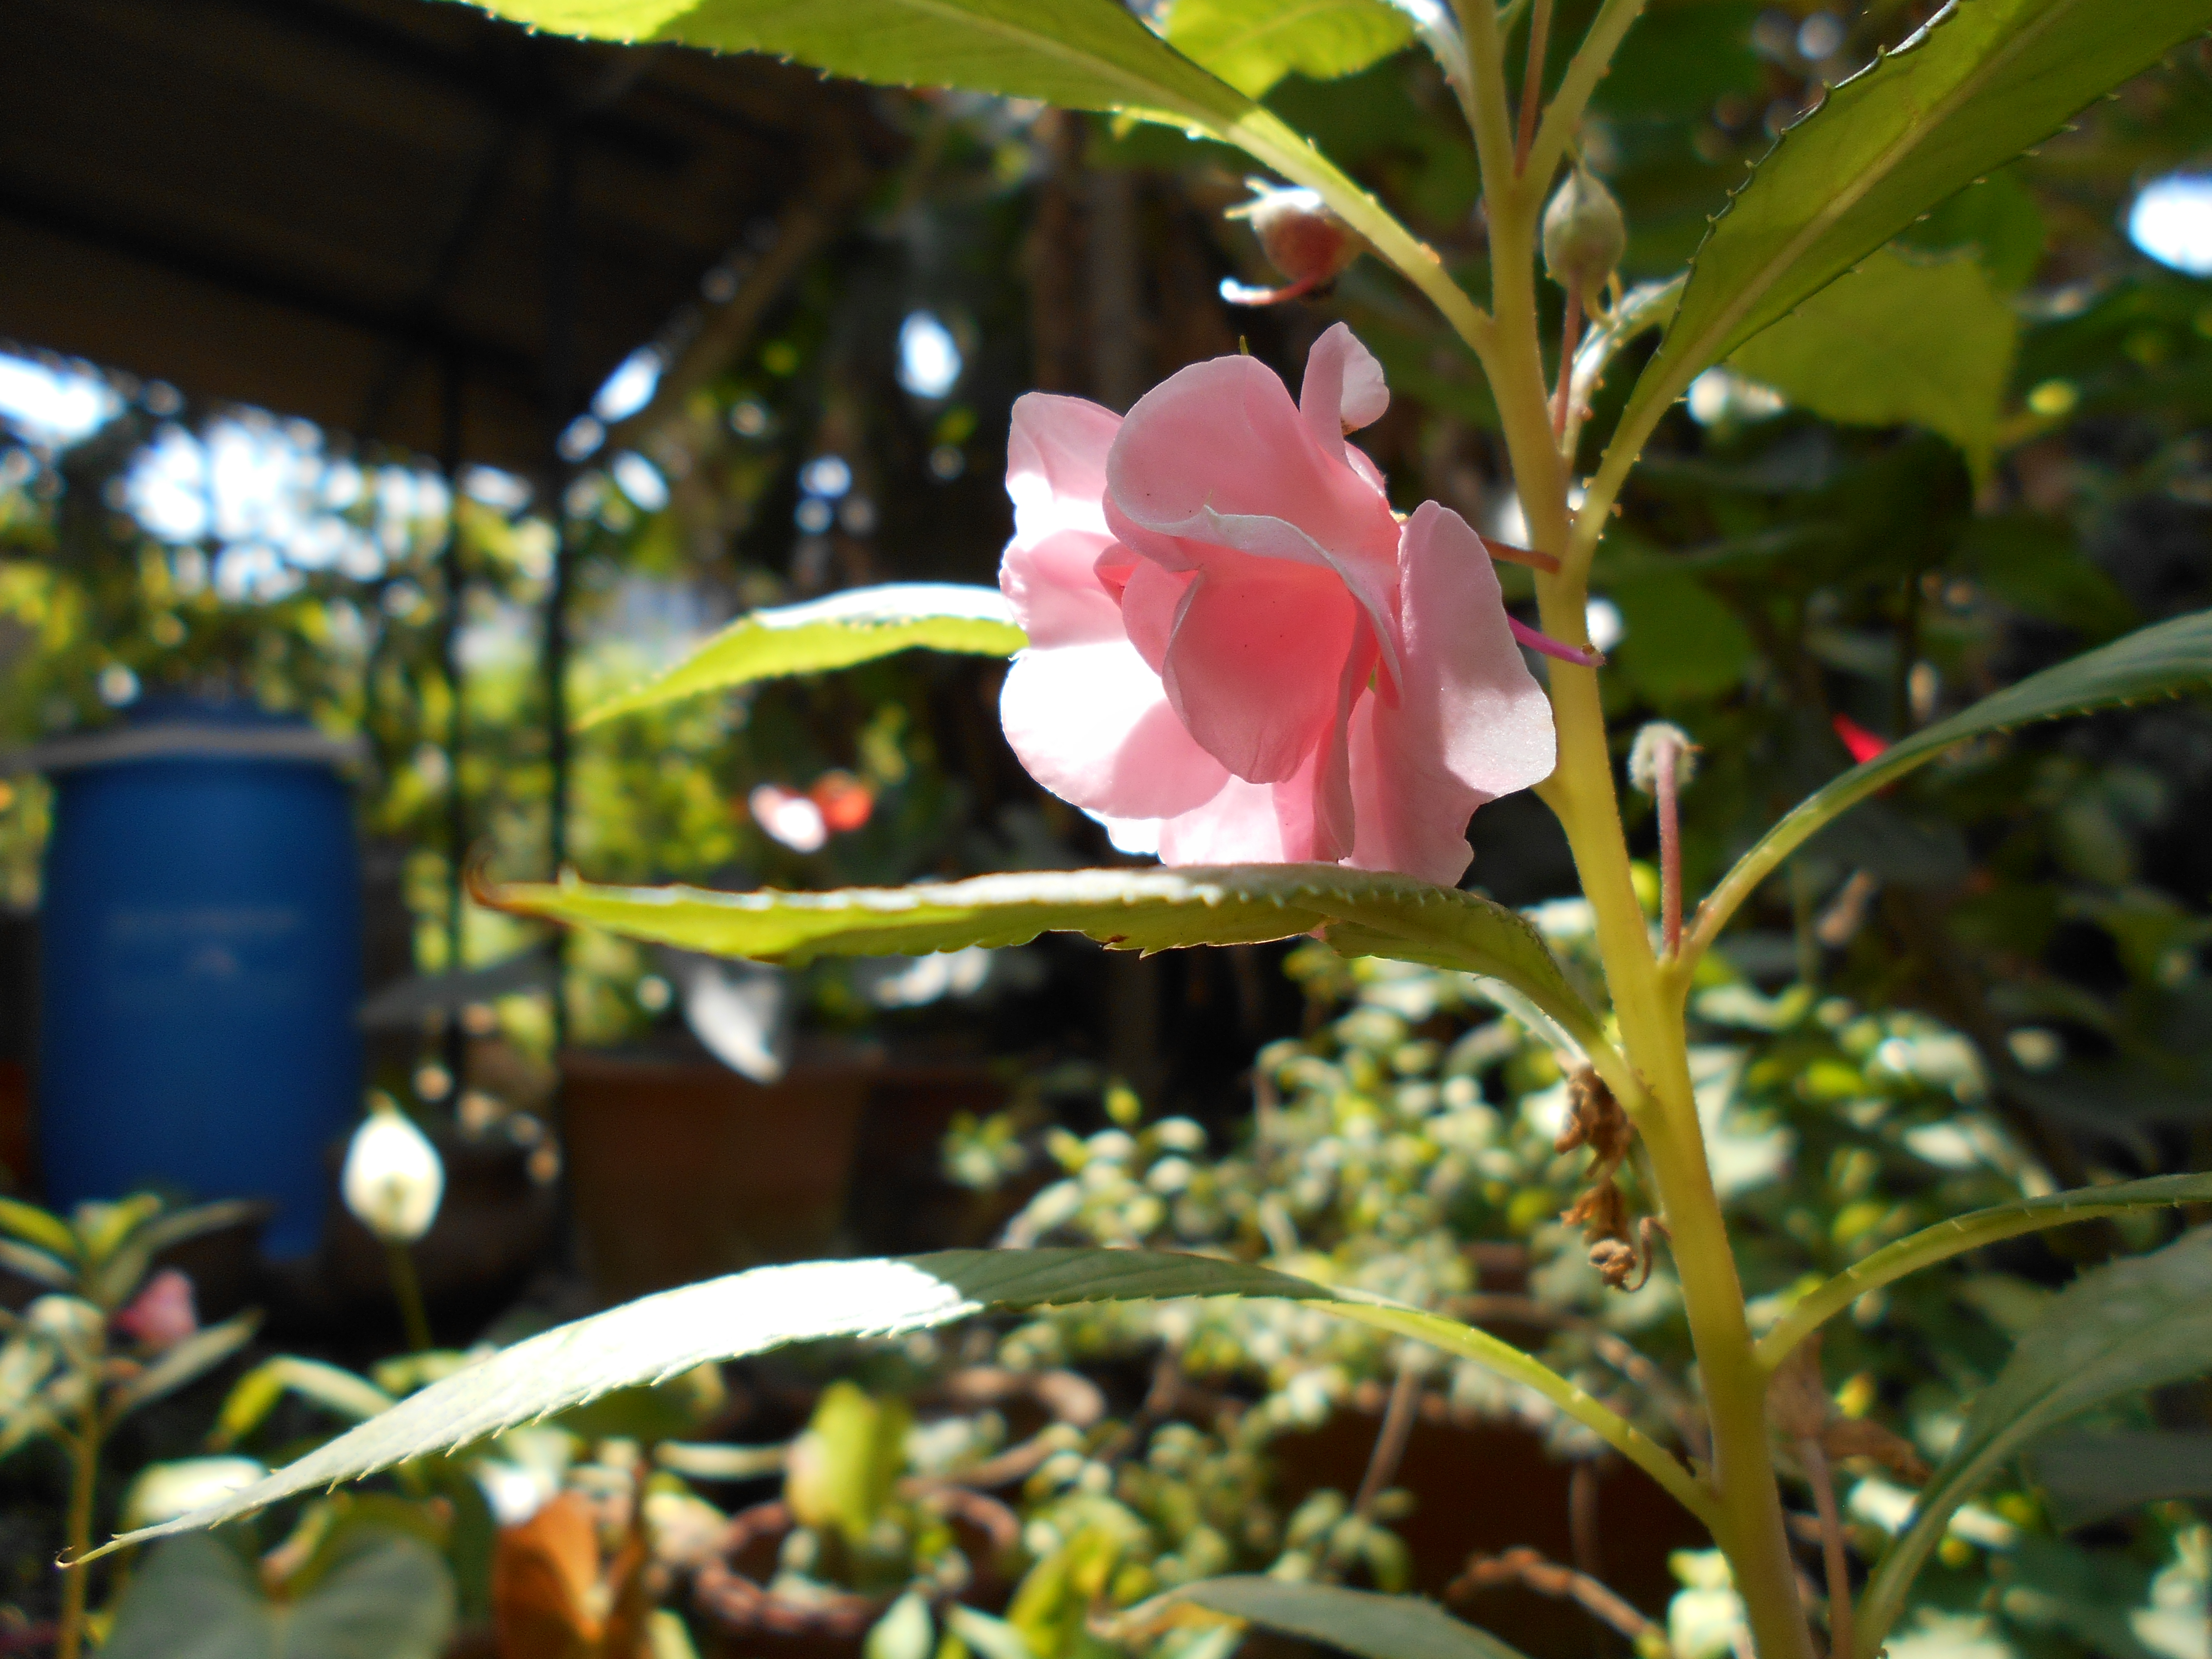 blossom by SheenMagic